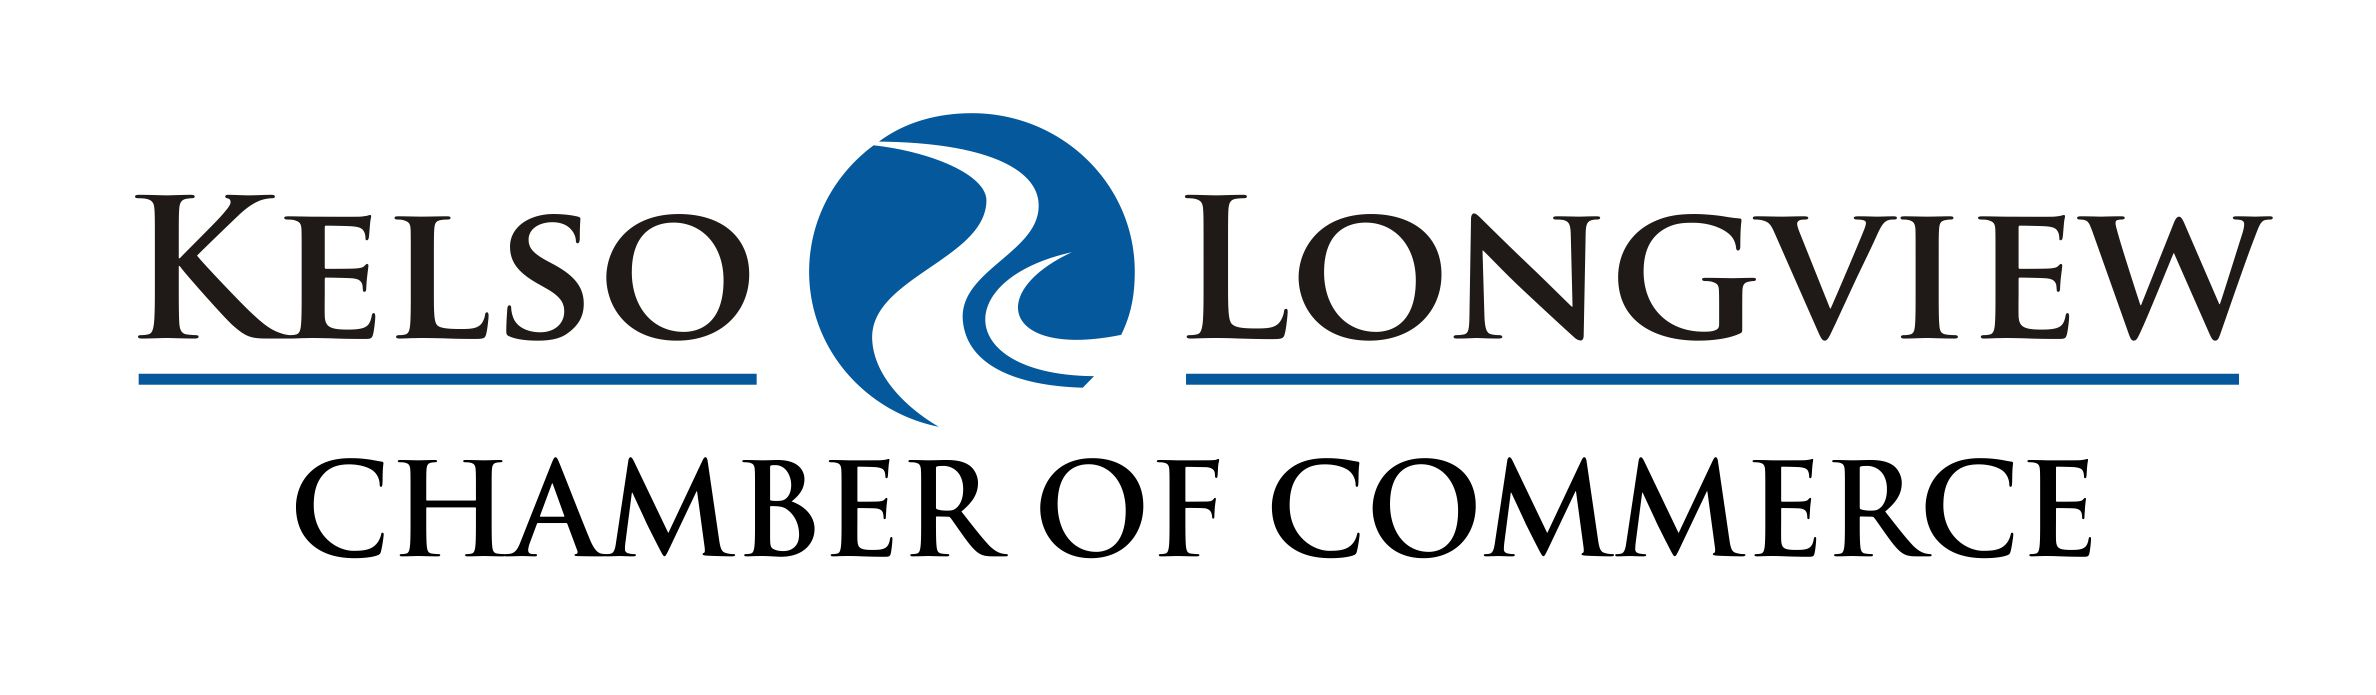 Kelso Longview chamber of commerce -